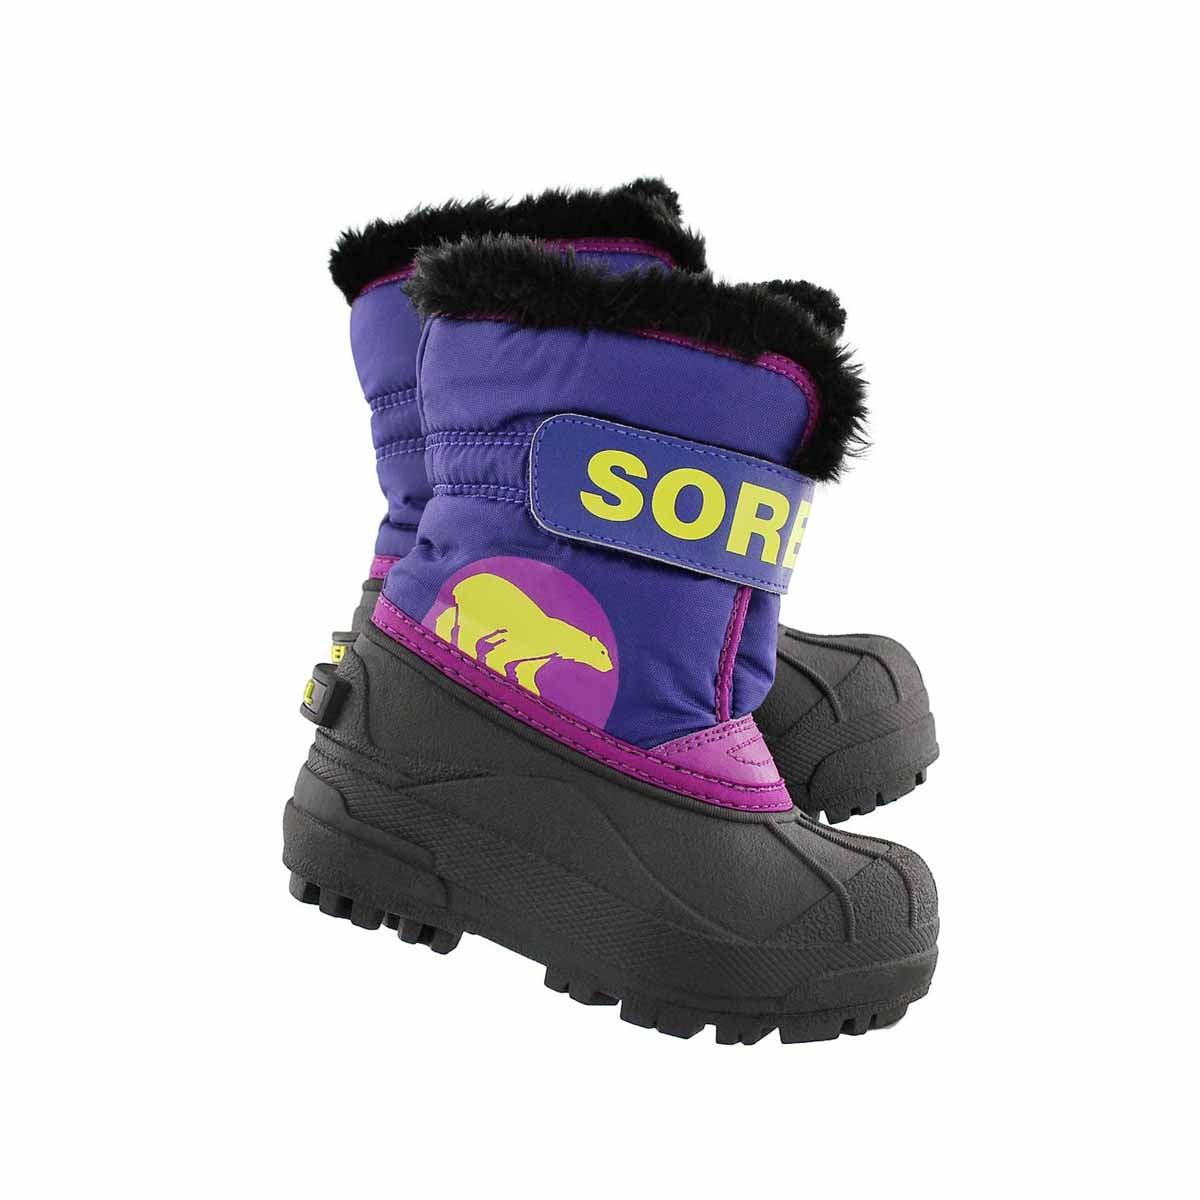 Inf Snow Commander grape/plum boot